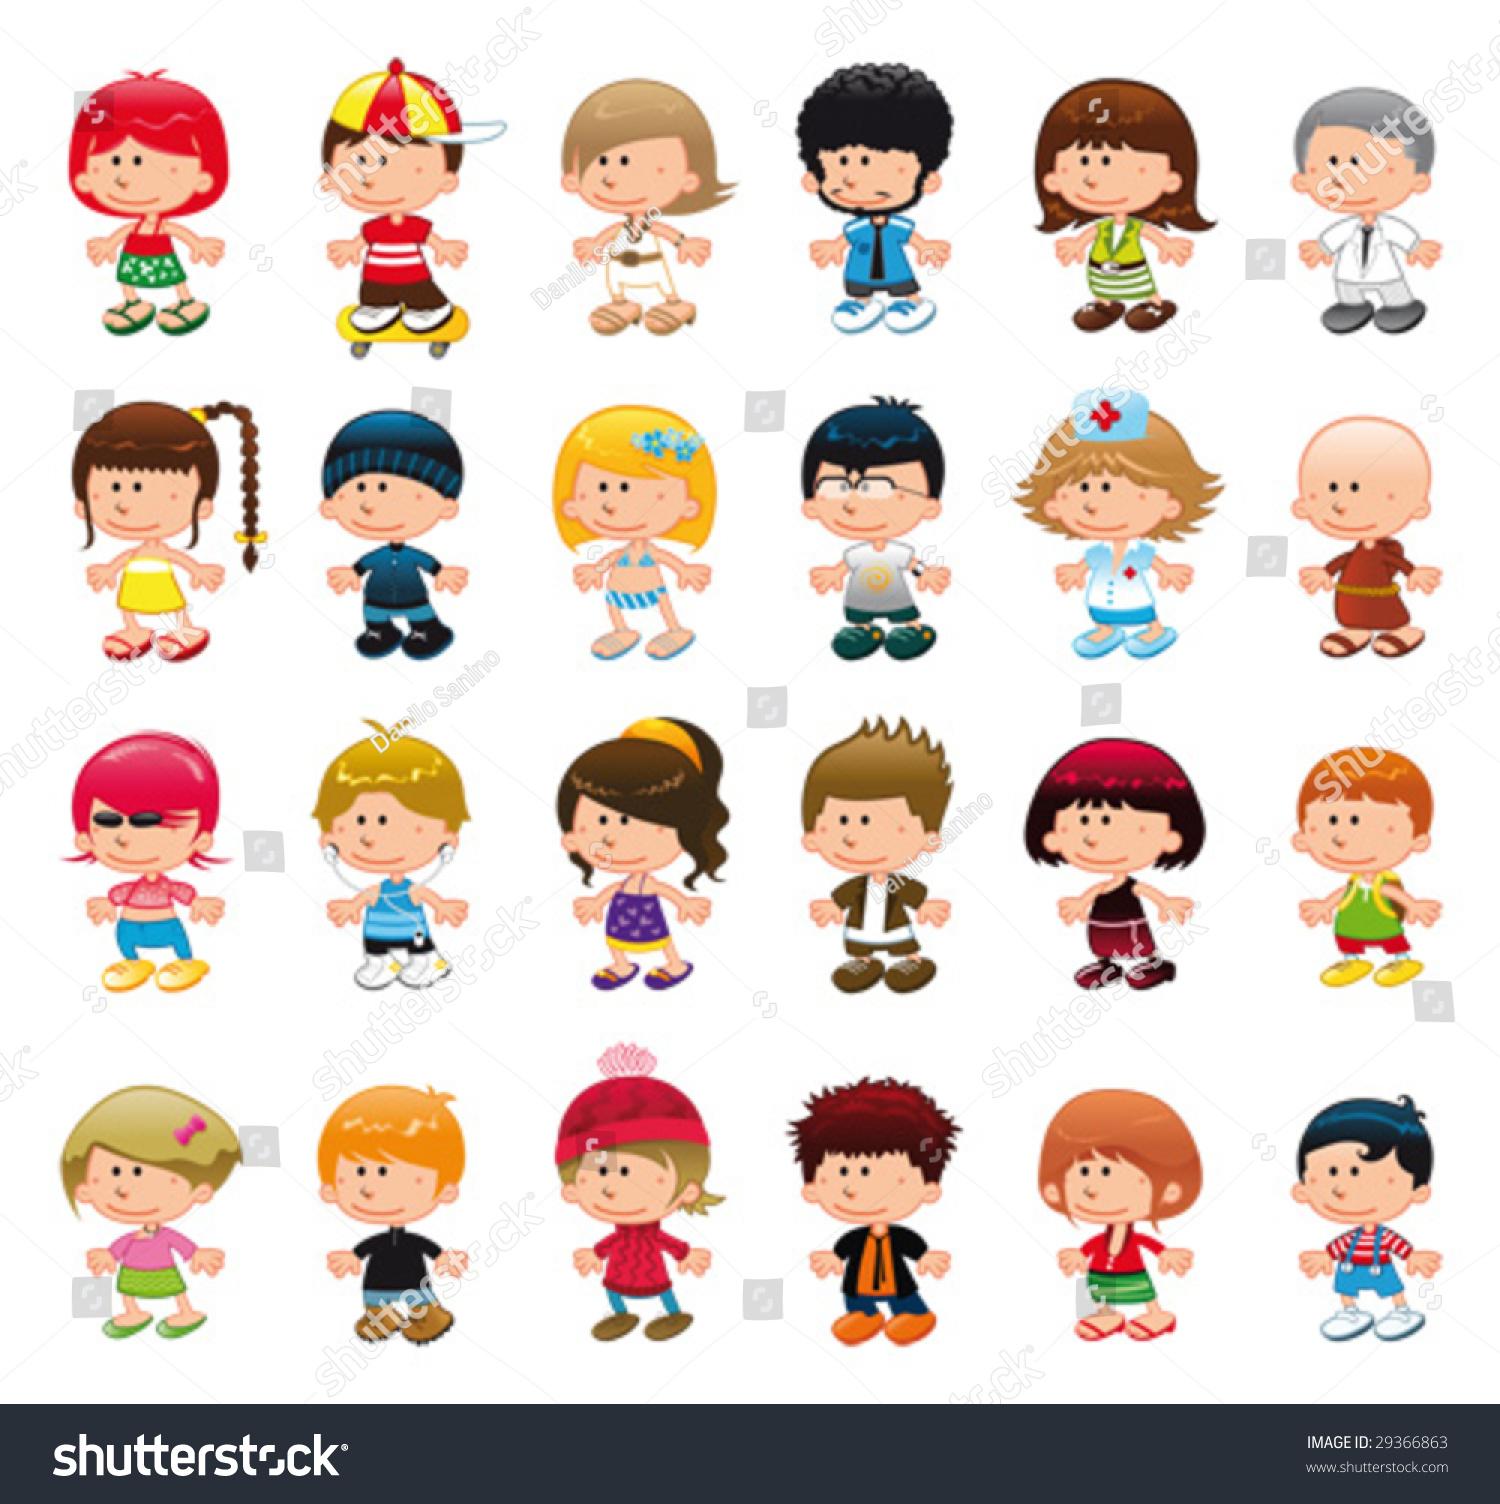 Funny Cartoon Images Of Boys boys girls funny cartoon vector isolated stock vector